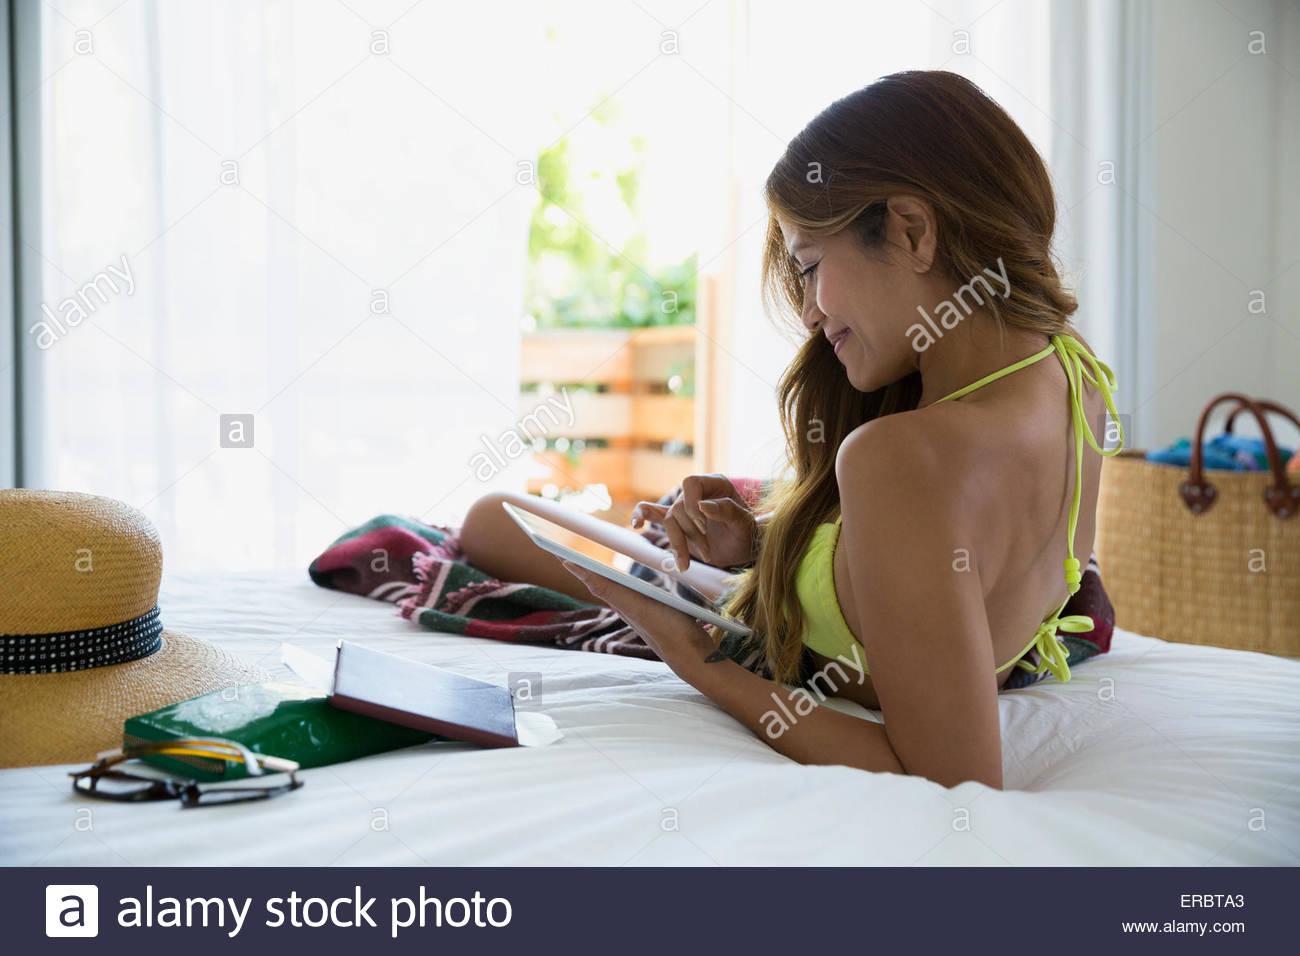 Woman in bikini using digital tablet on bed - Stock Image